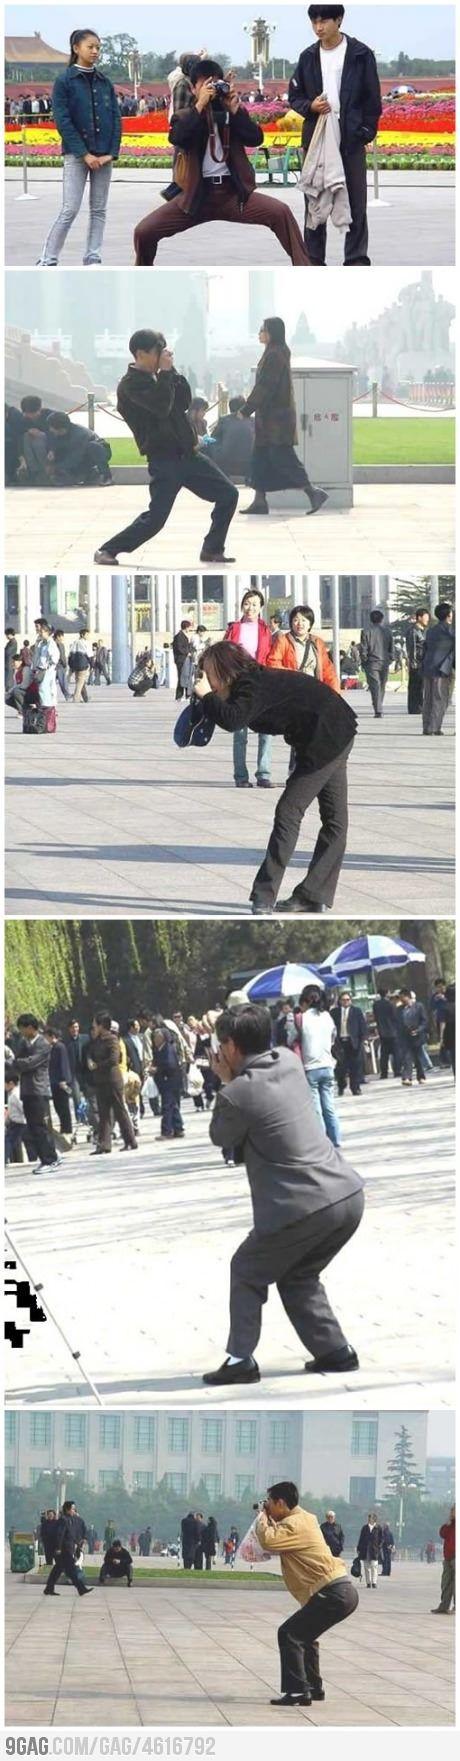 Cameraman lvl = Asian